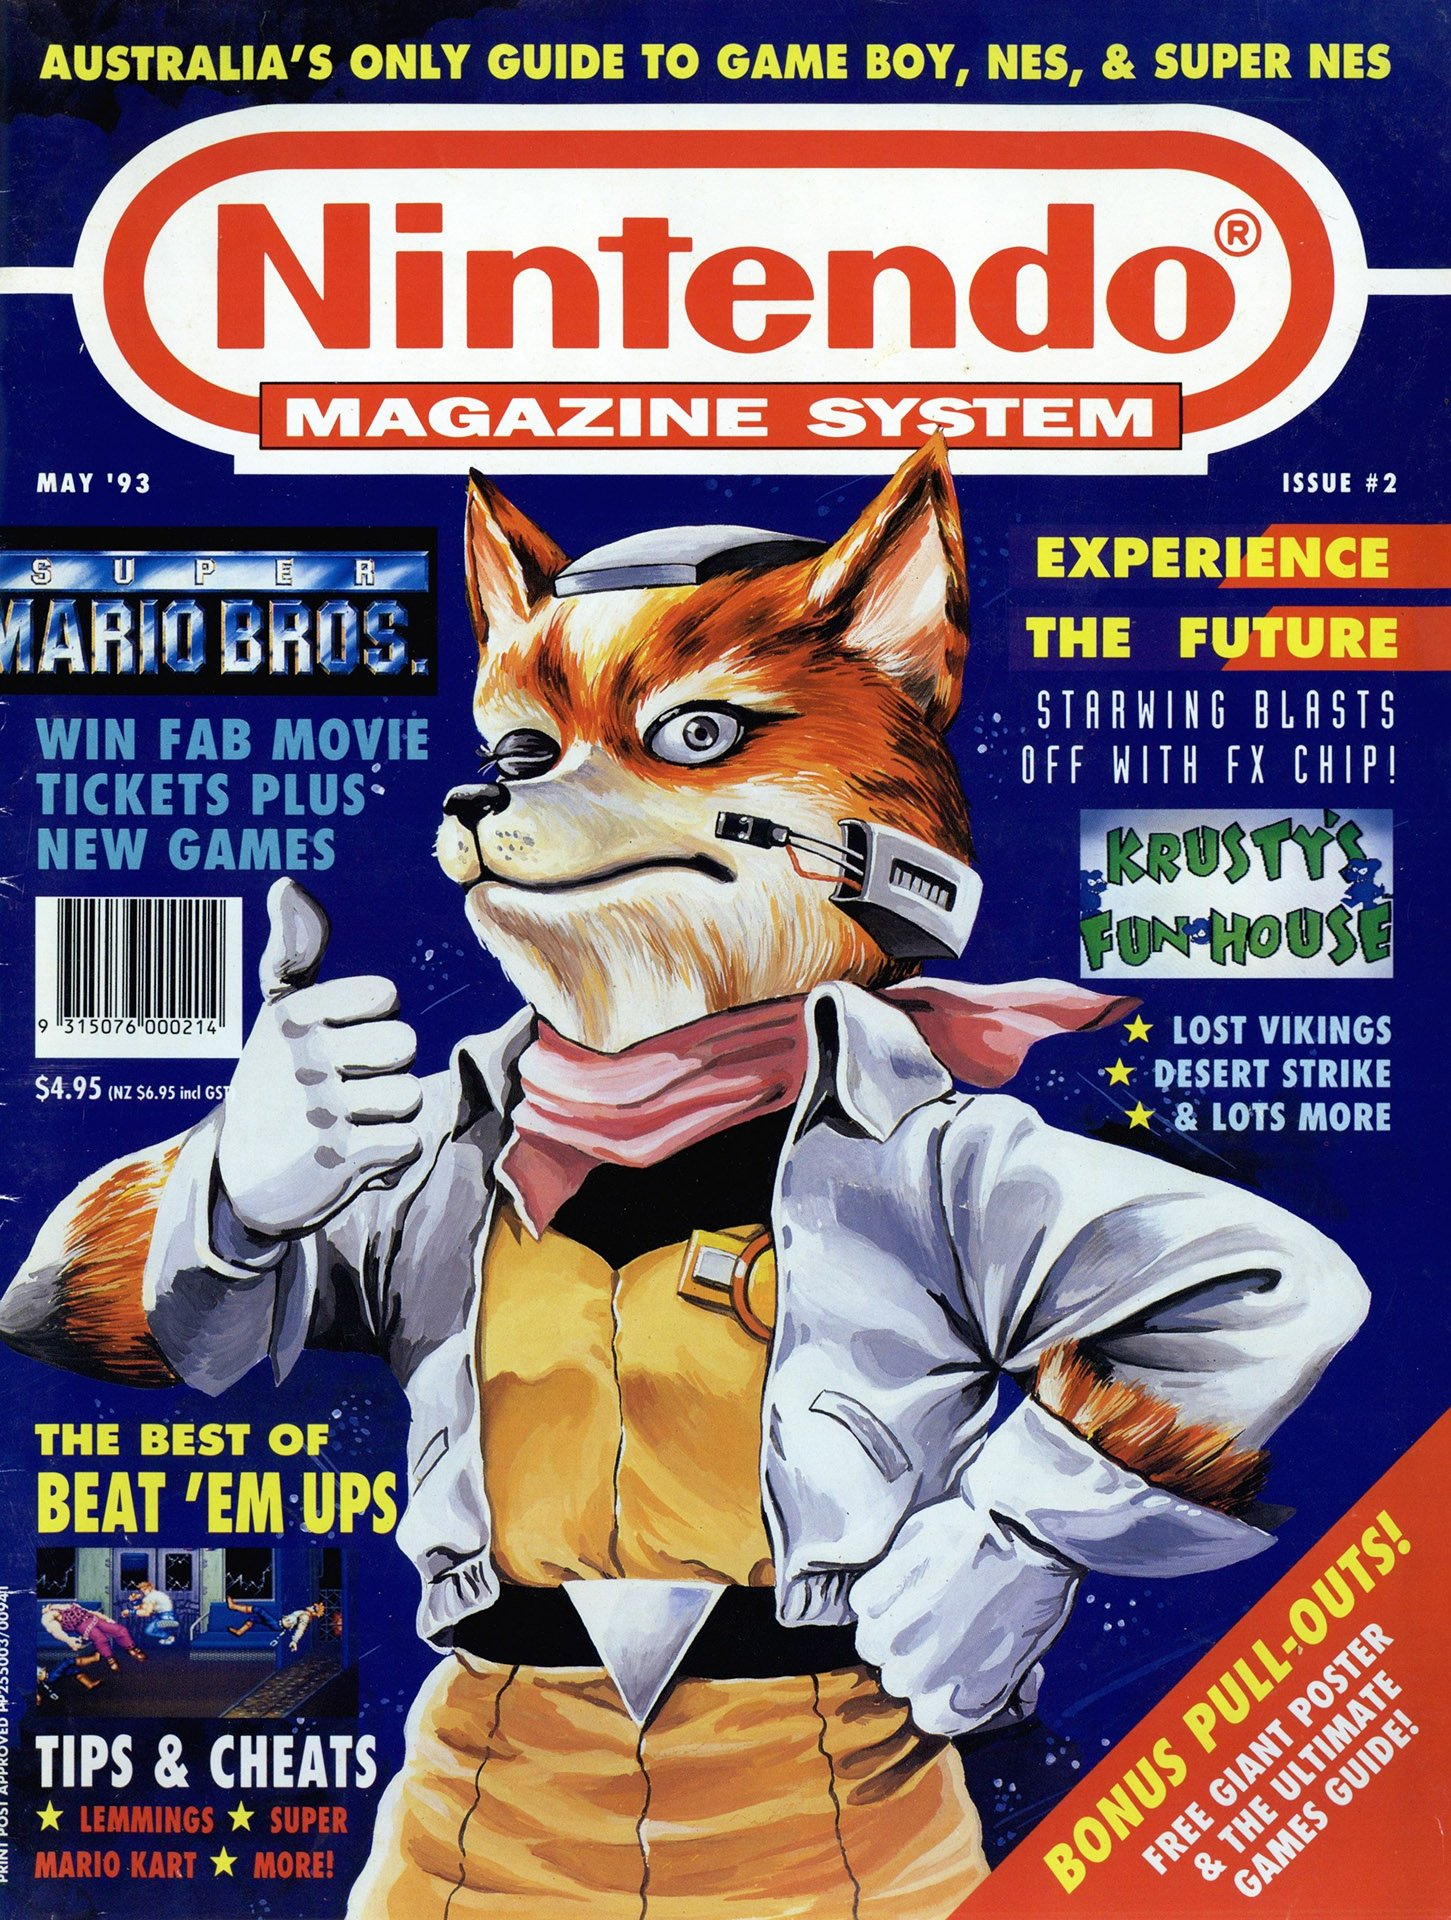 Nintendo Magazine System (AUS) 002 (May 1993)